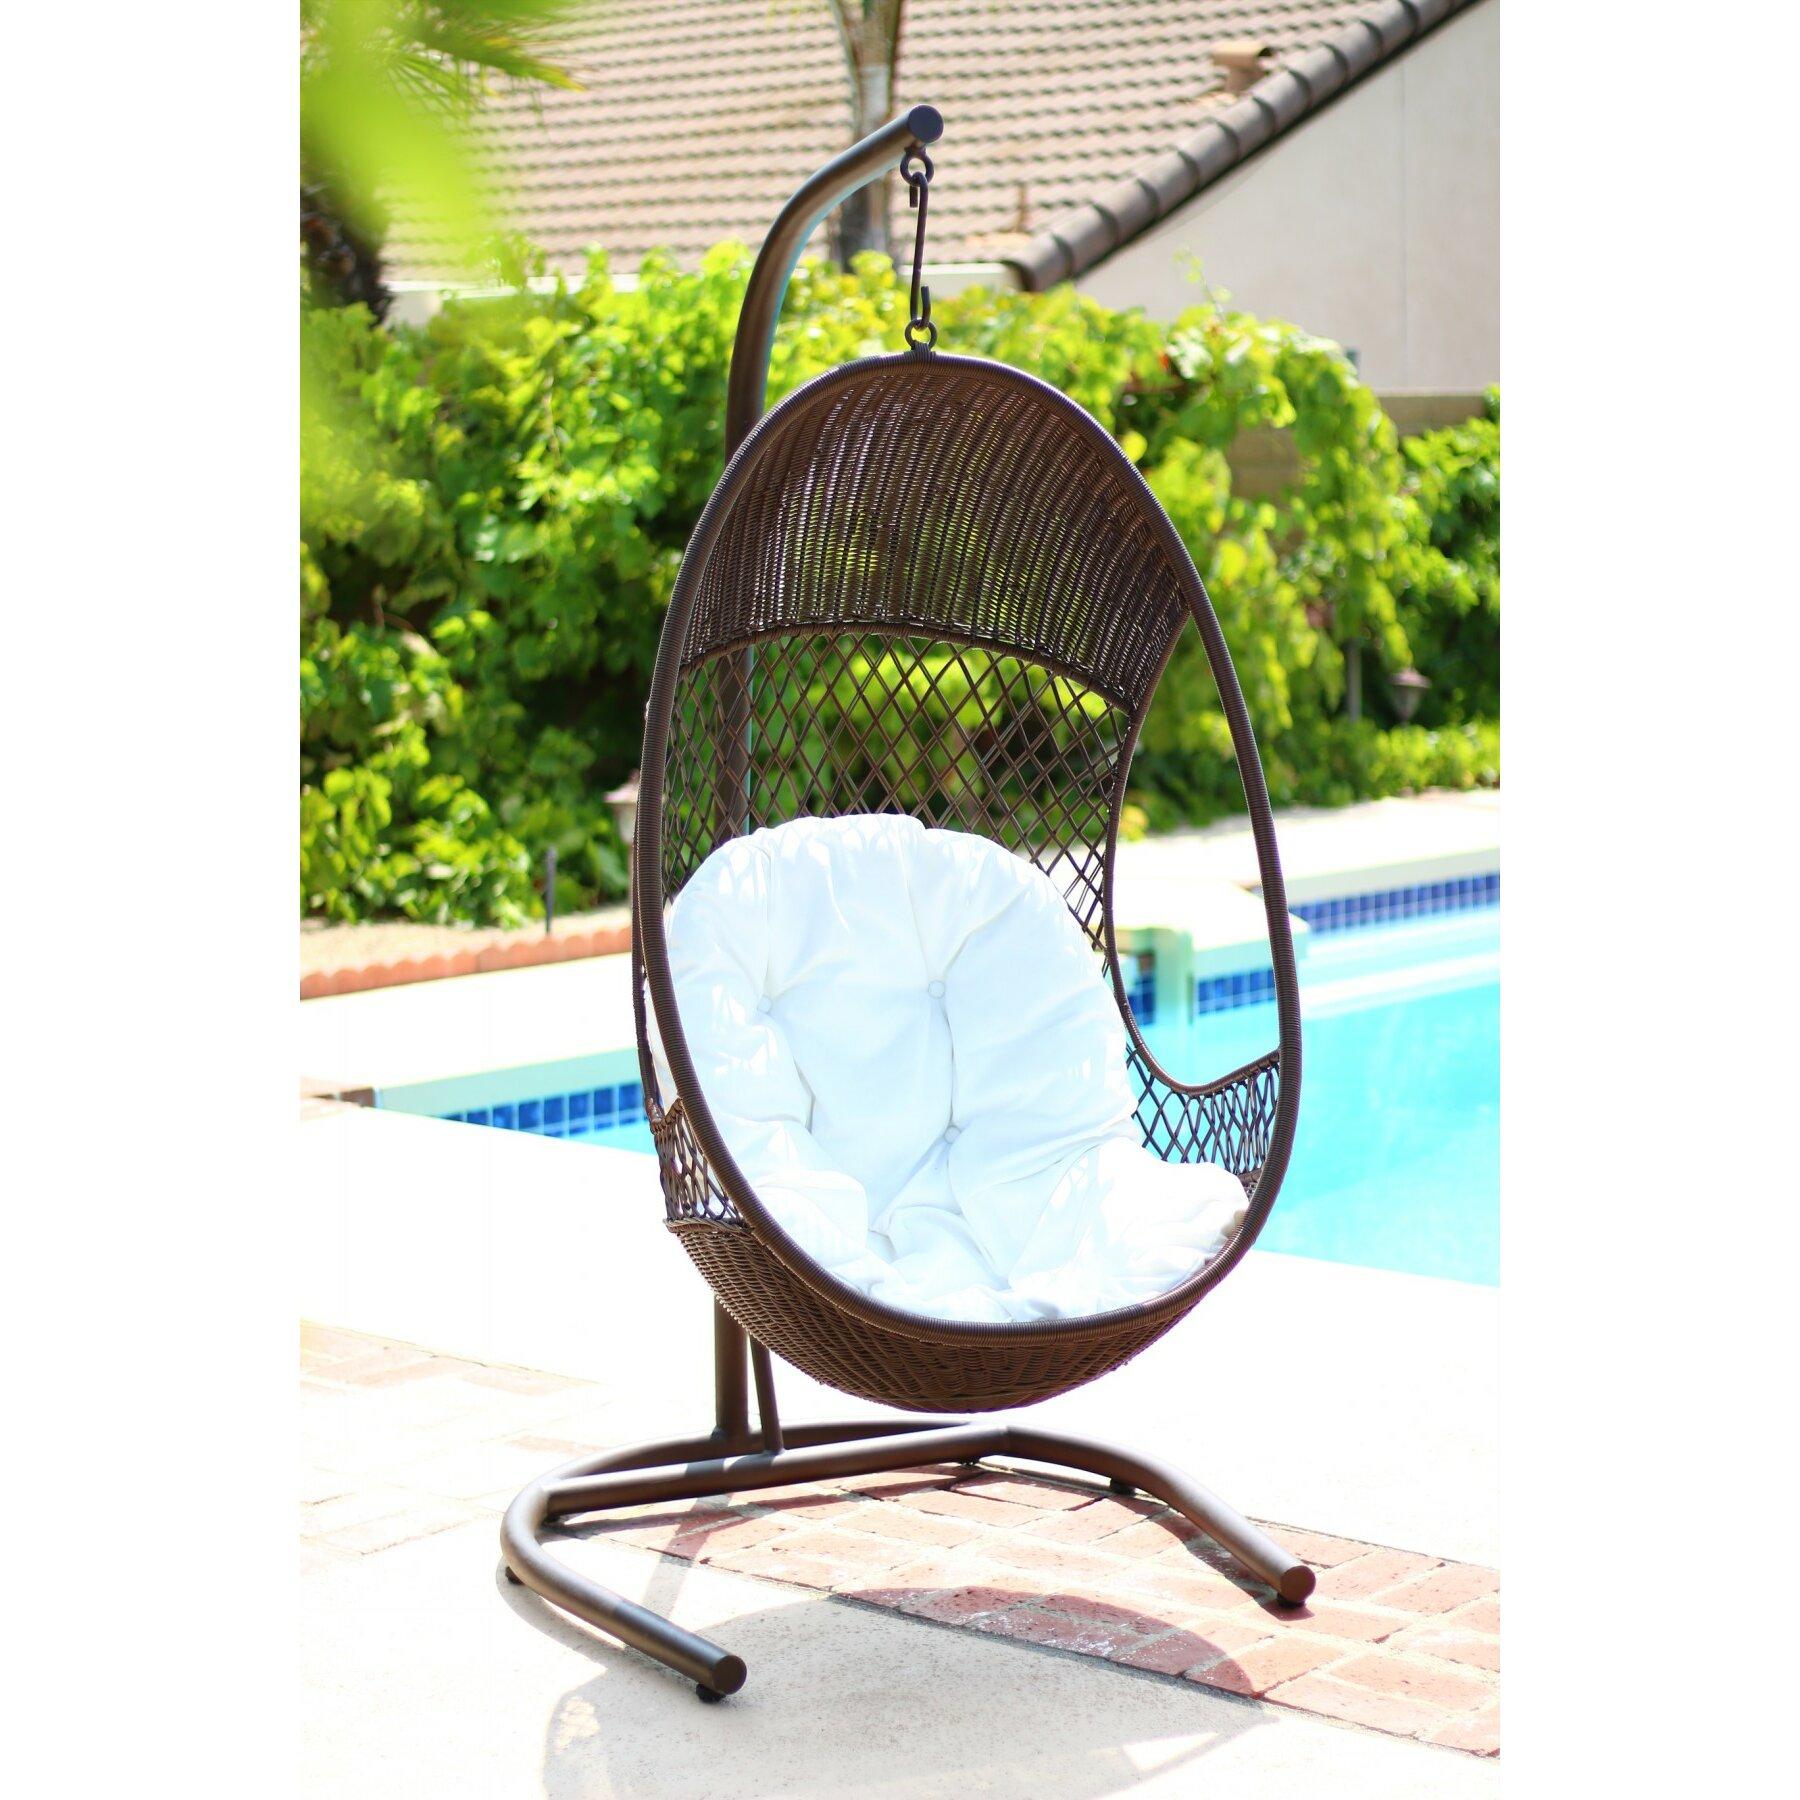 Alpine Alpine Swing Chair with Cushions | Wayfair